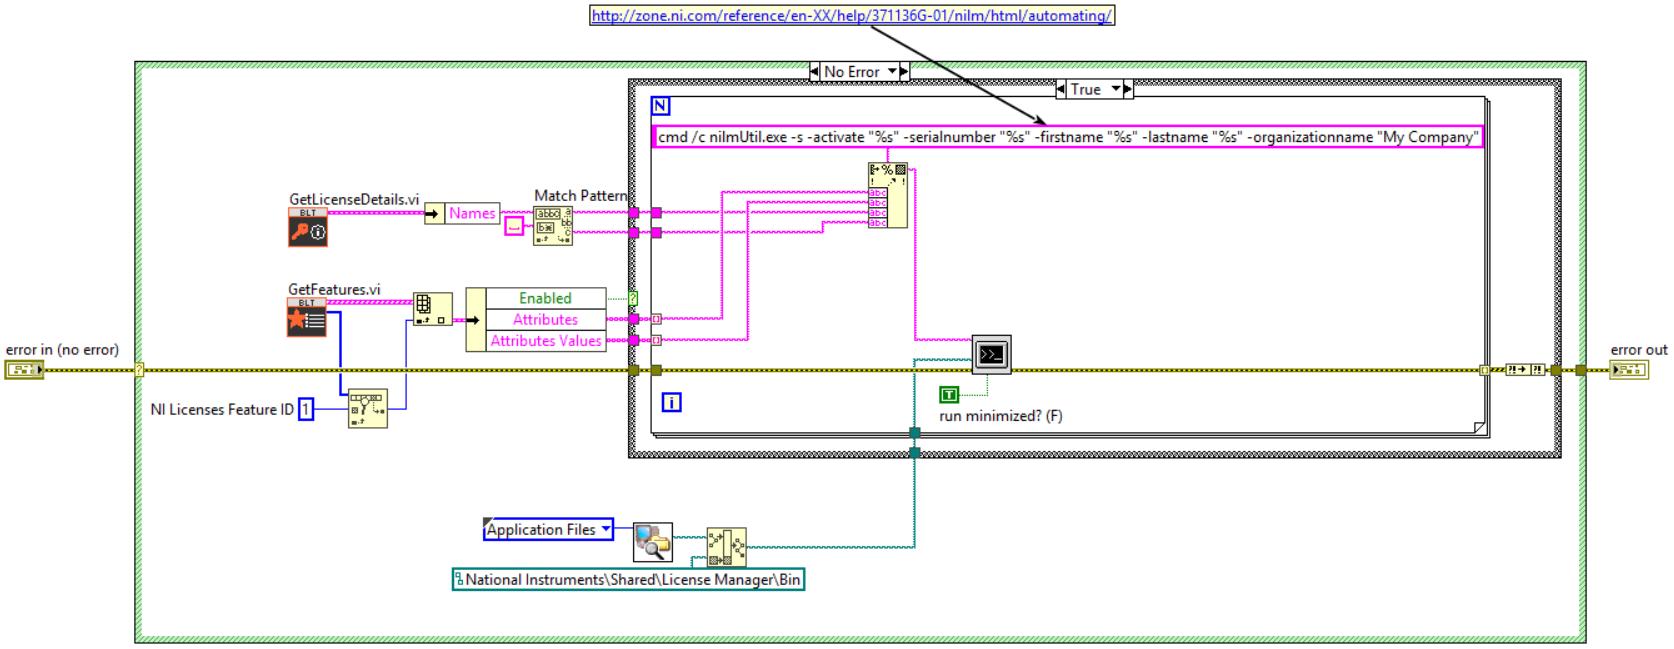 Block Diagram - Programmatically Activate NI Licenses